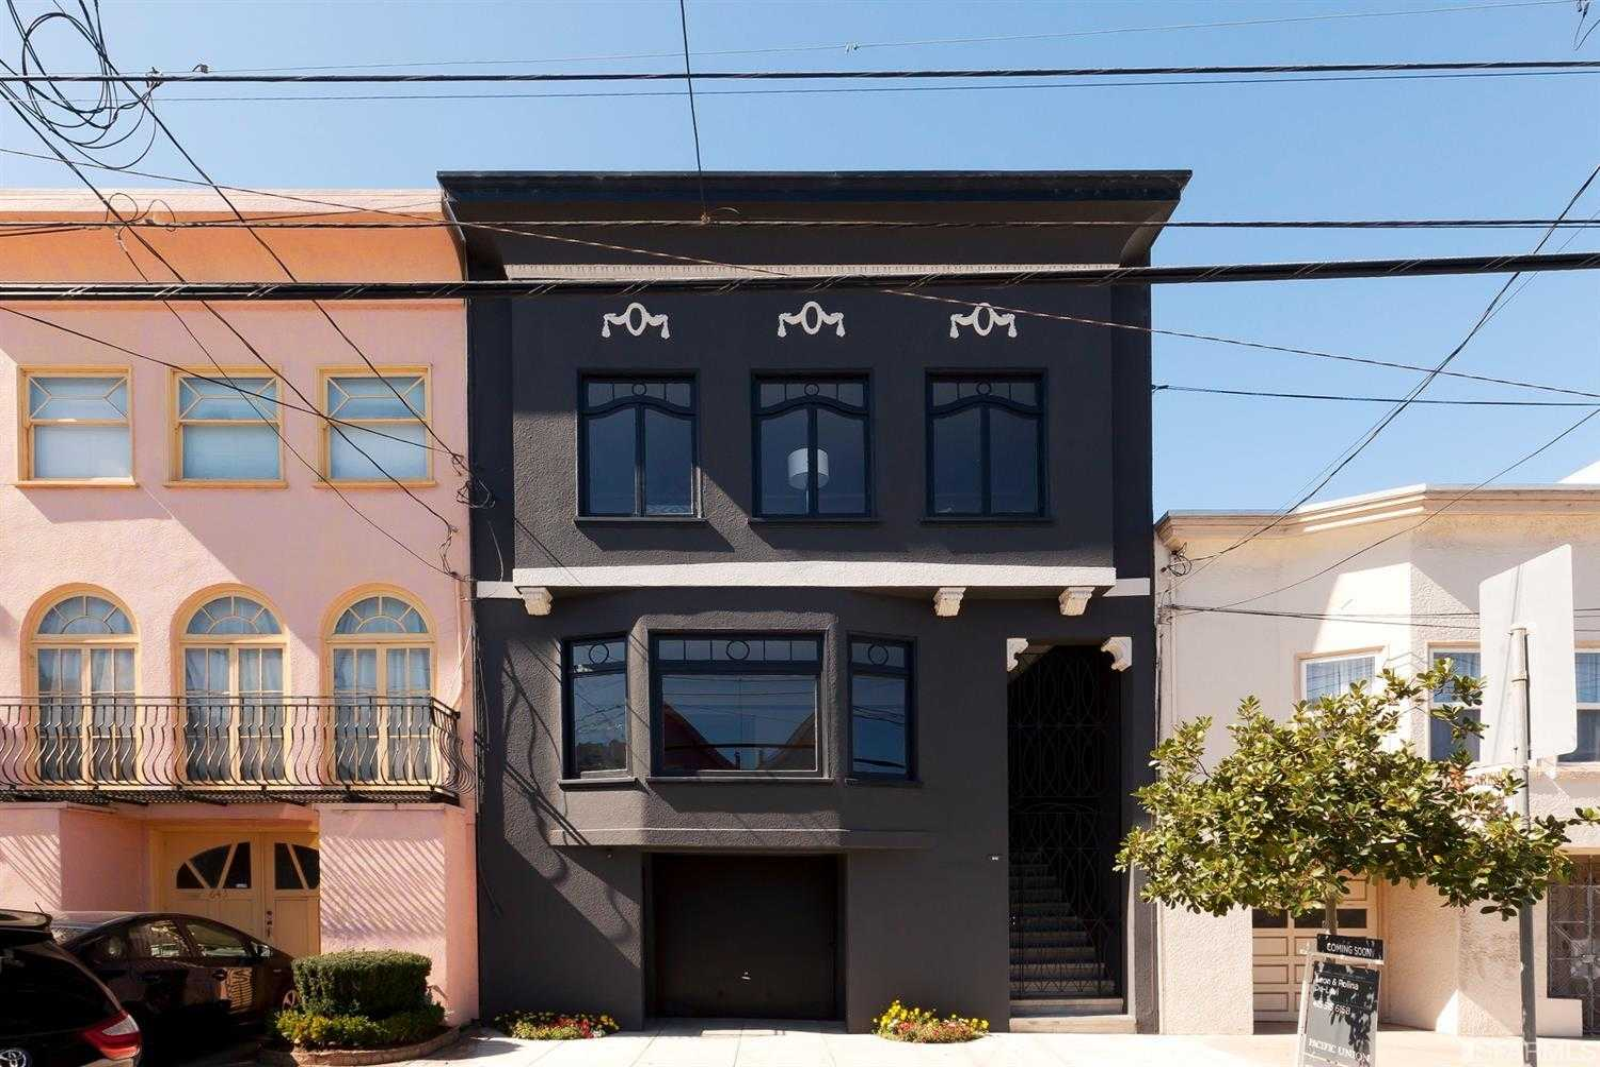 639 641 18th Avenue San Francisco, CA 94121